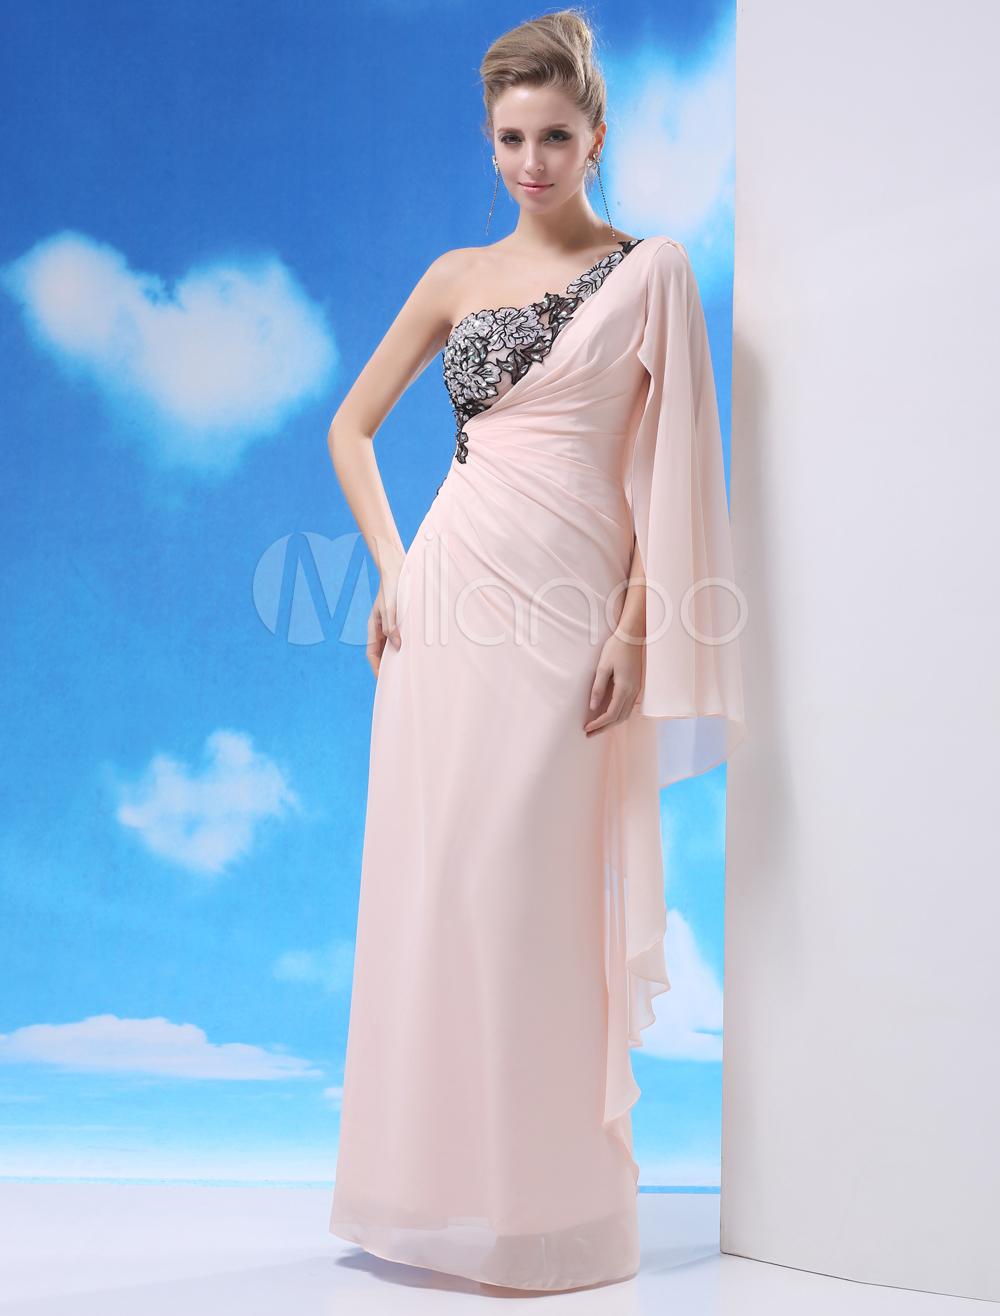 Pink One-Shoulder Beading Sheath Chiffon Charming Prom Dress Milanoo (Wedding Prom Dresses) photo